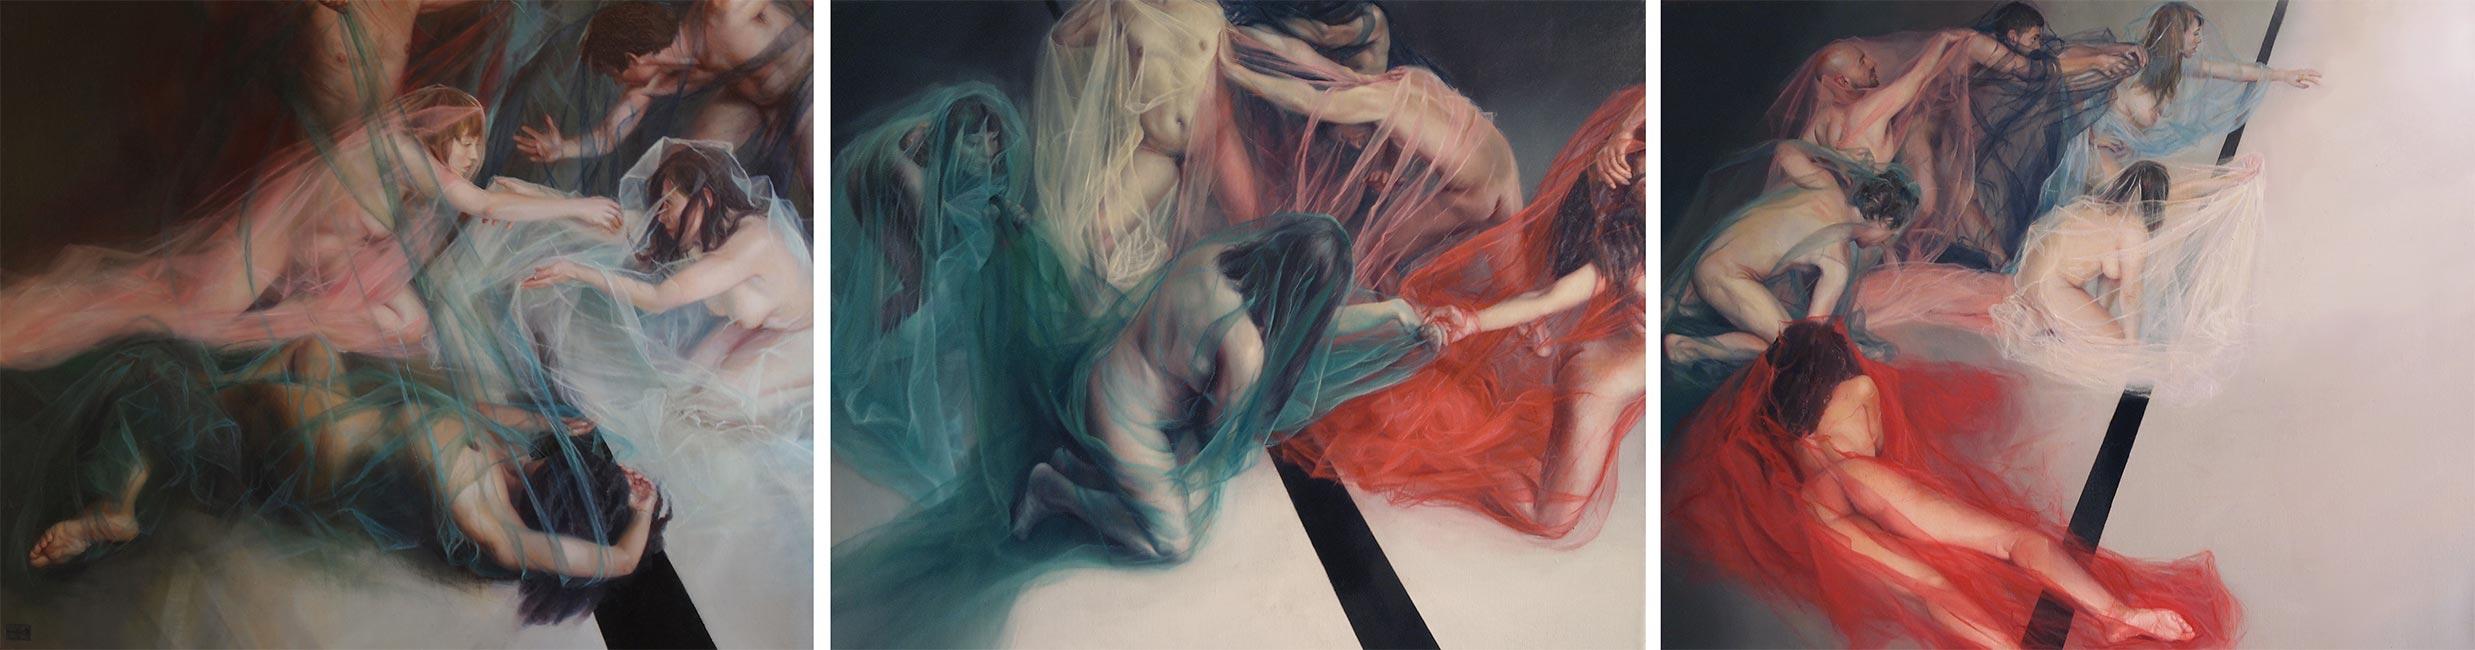 Ewelina Koszykowska - We Are Lost (Triptych)